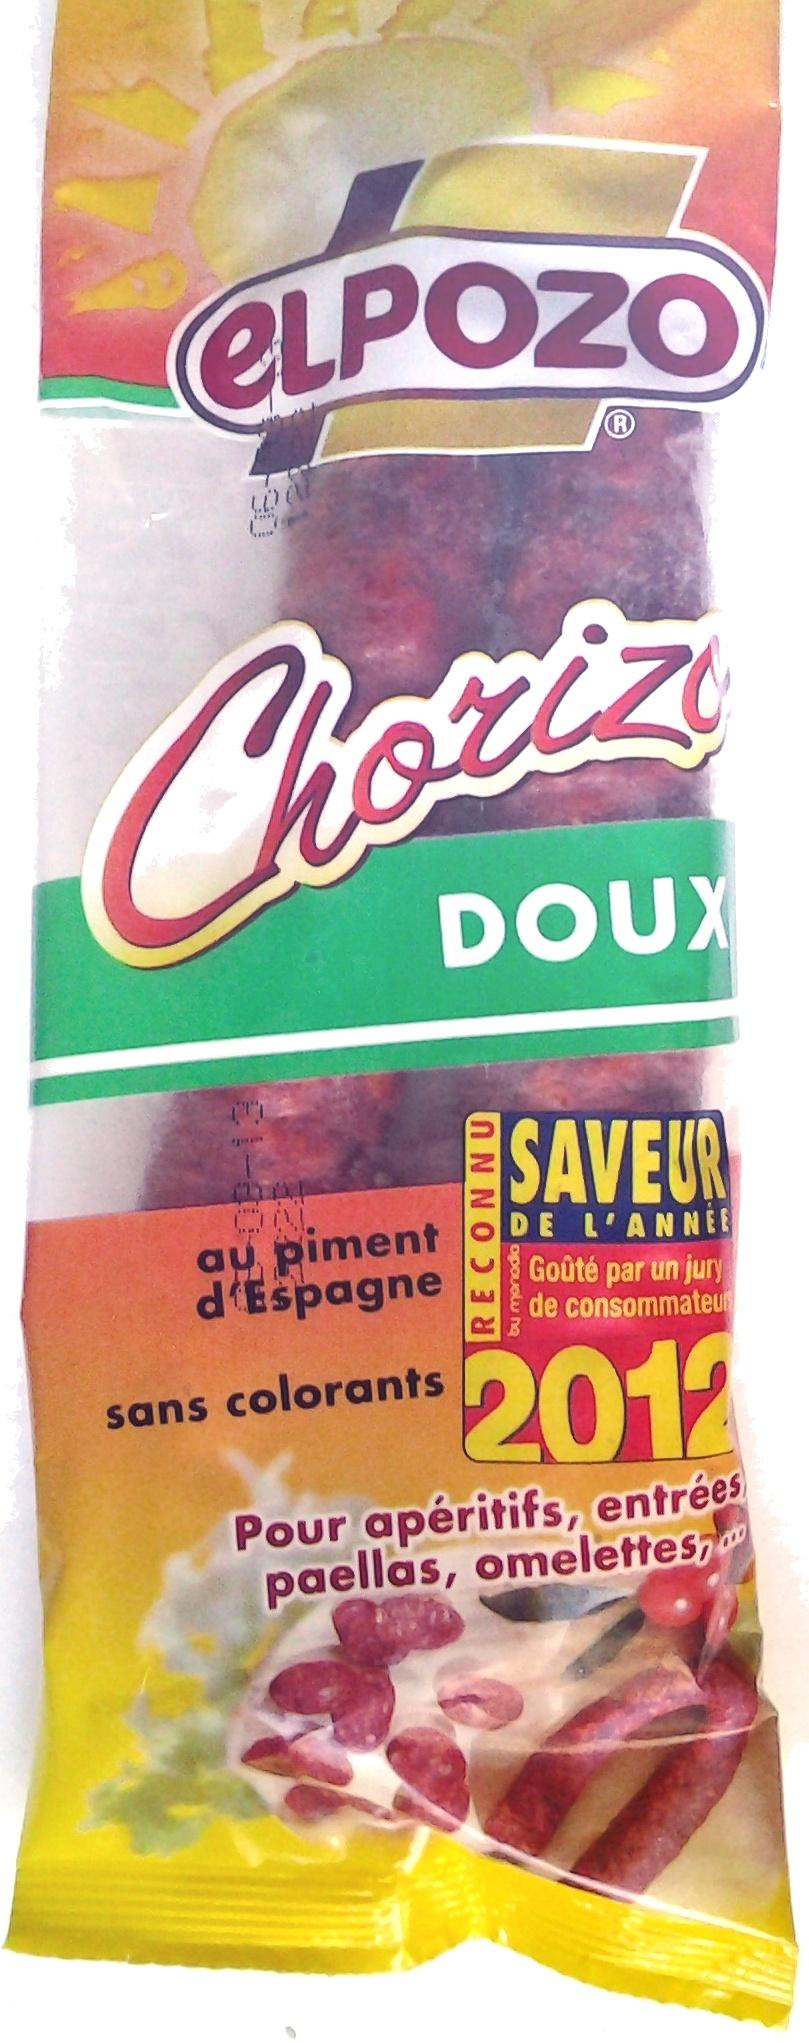 Chorizo Doux - Product